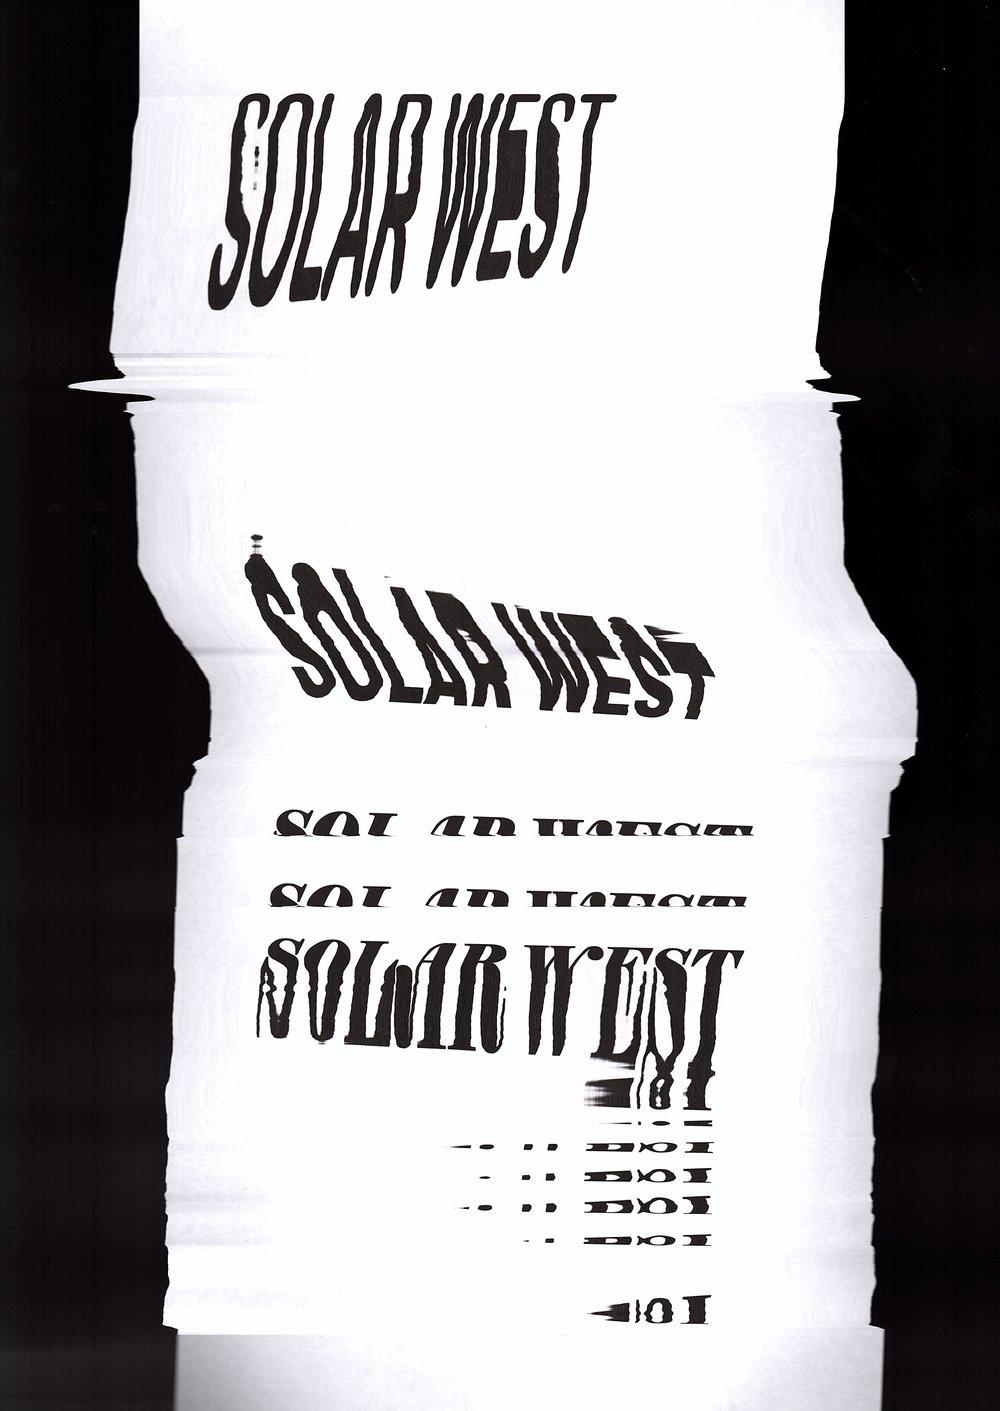 SOLARWEST 004.jpg